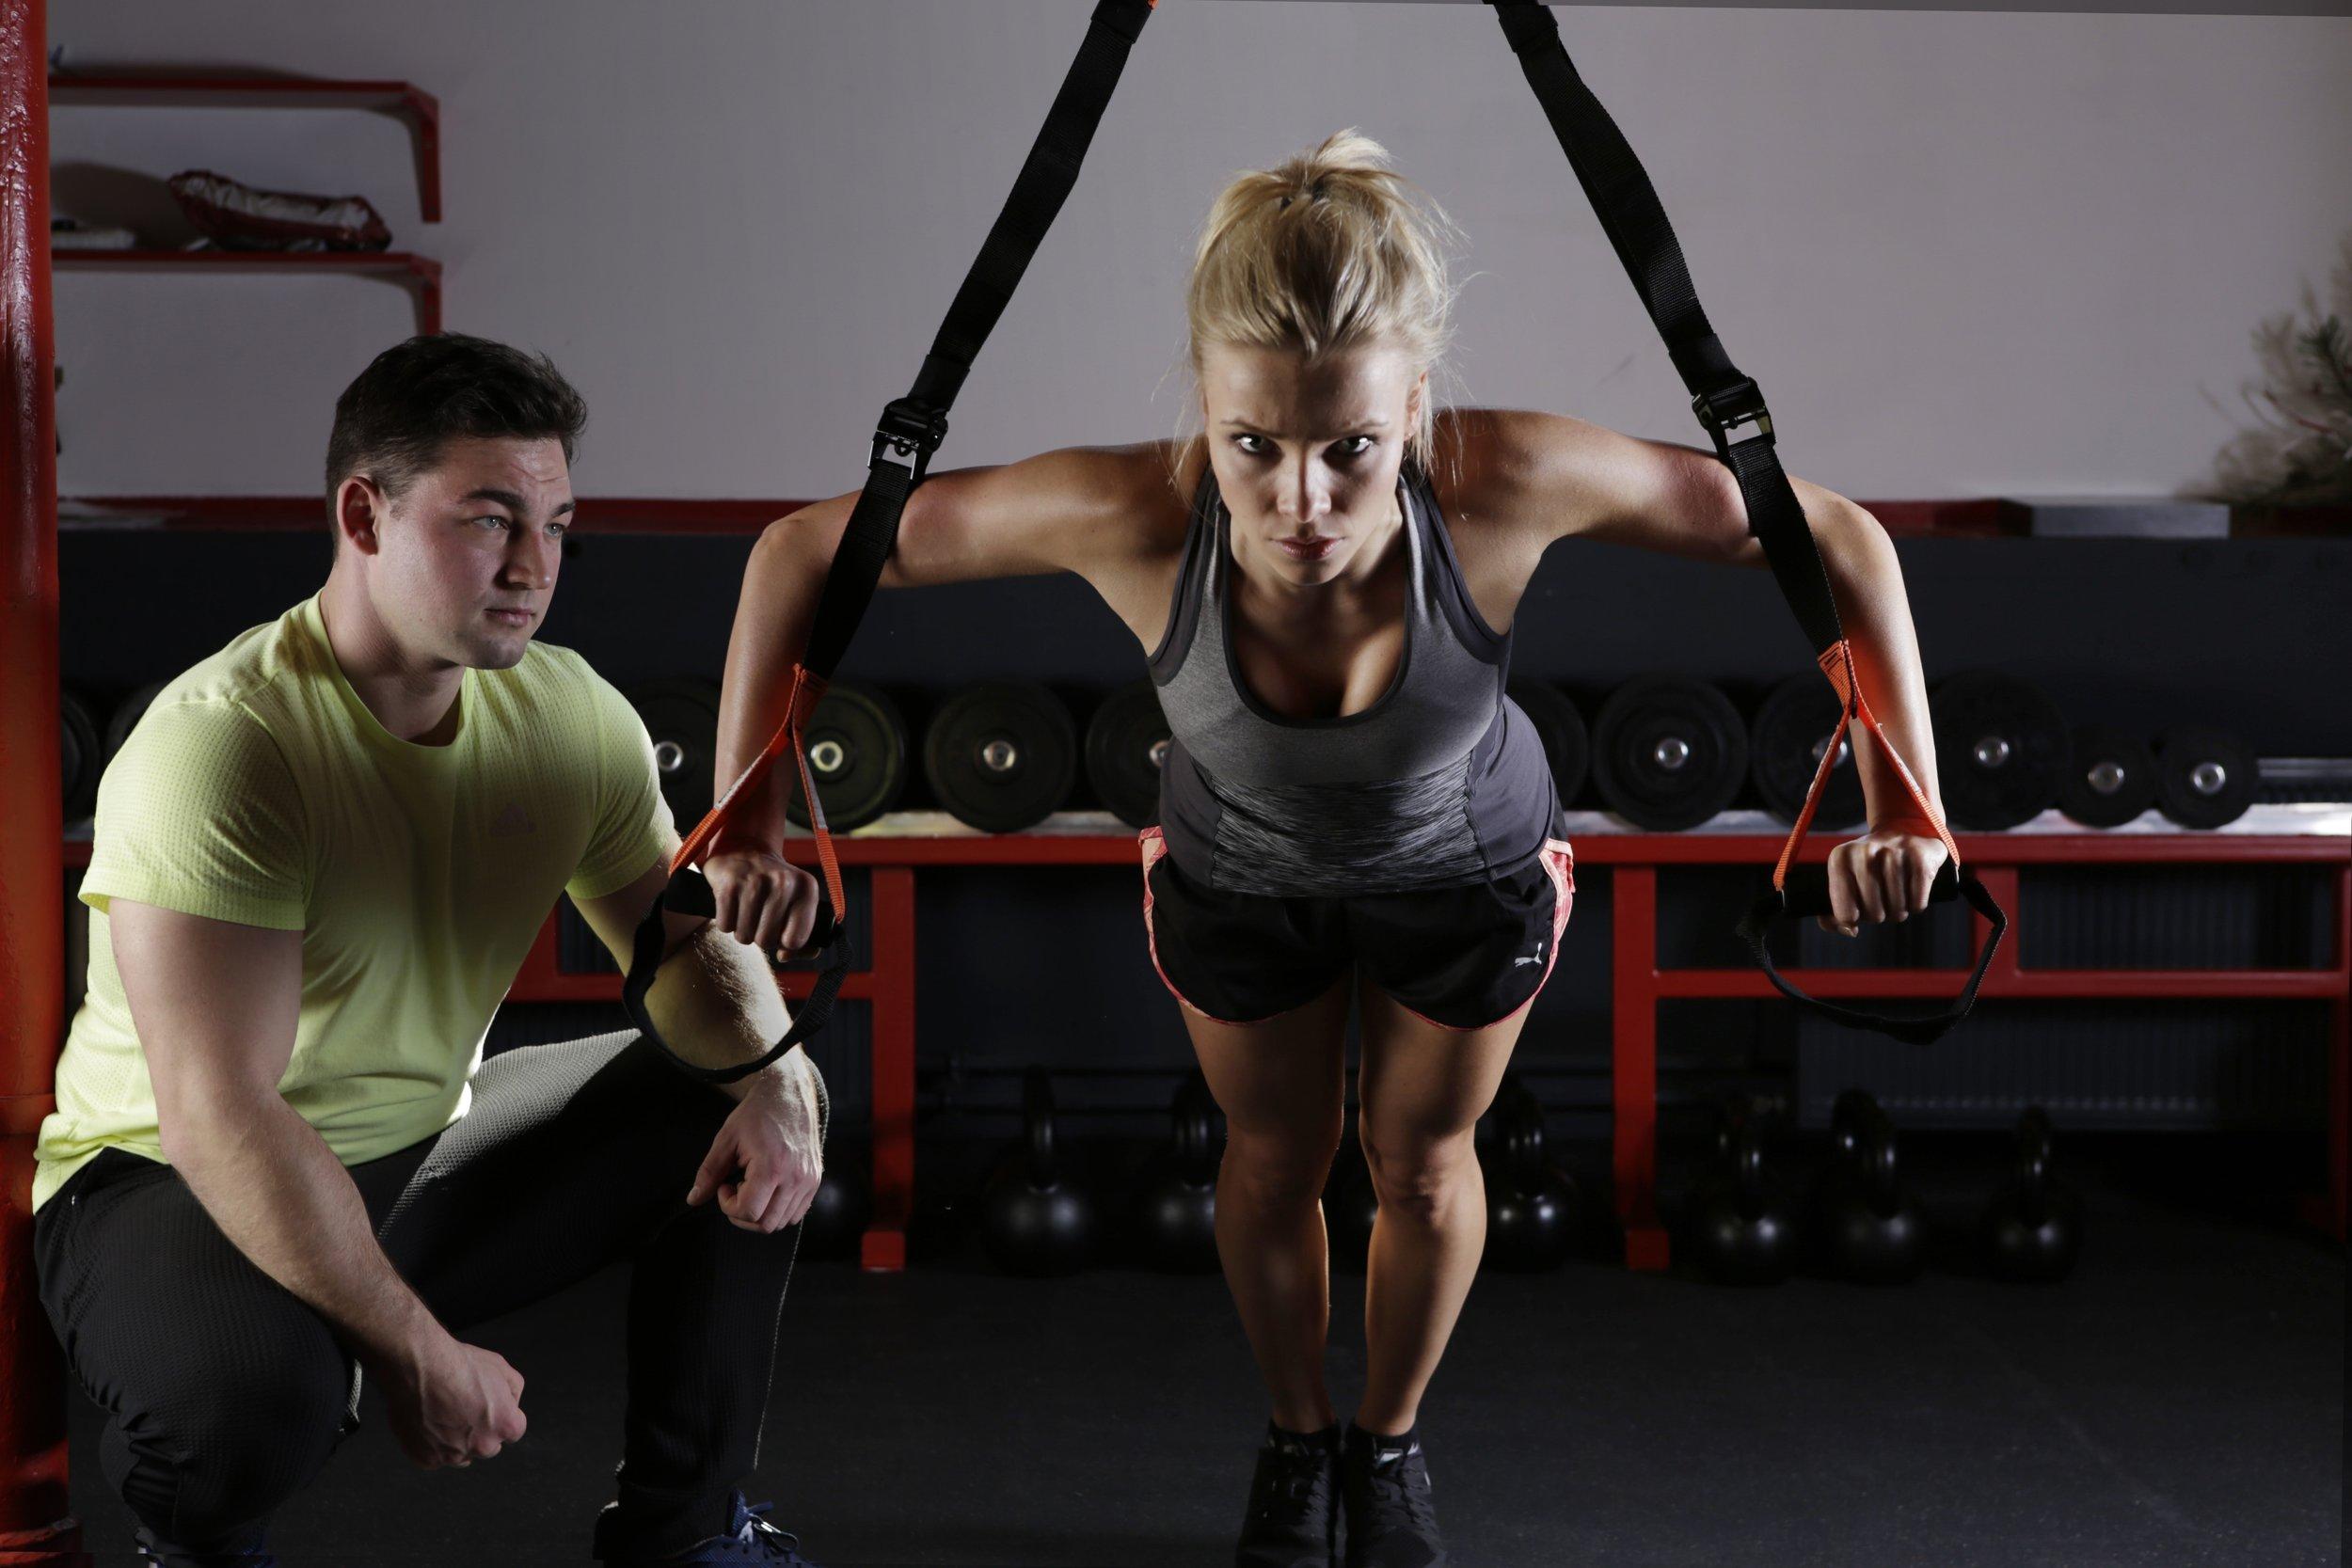 adult-athlete-body-414029.jpg